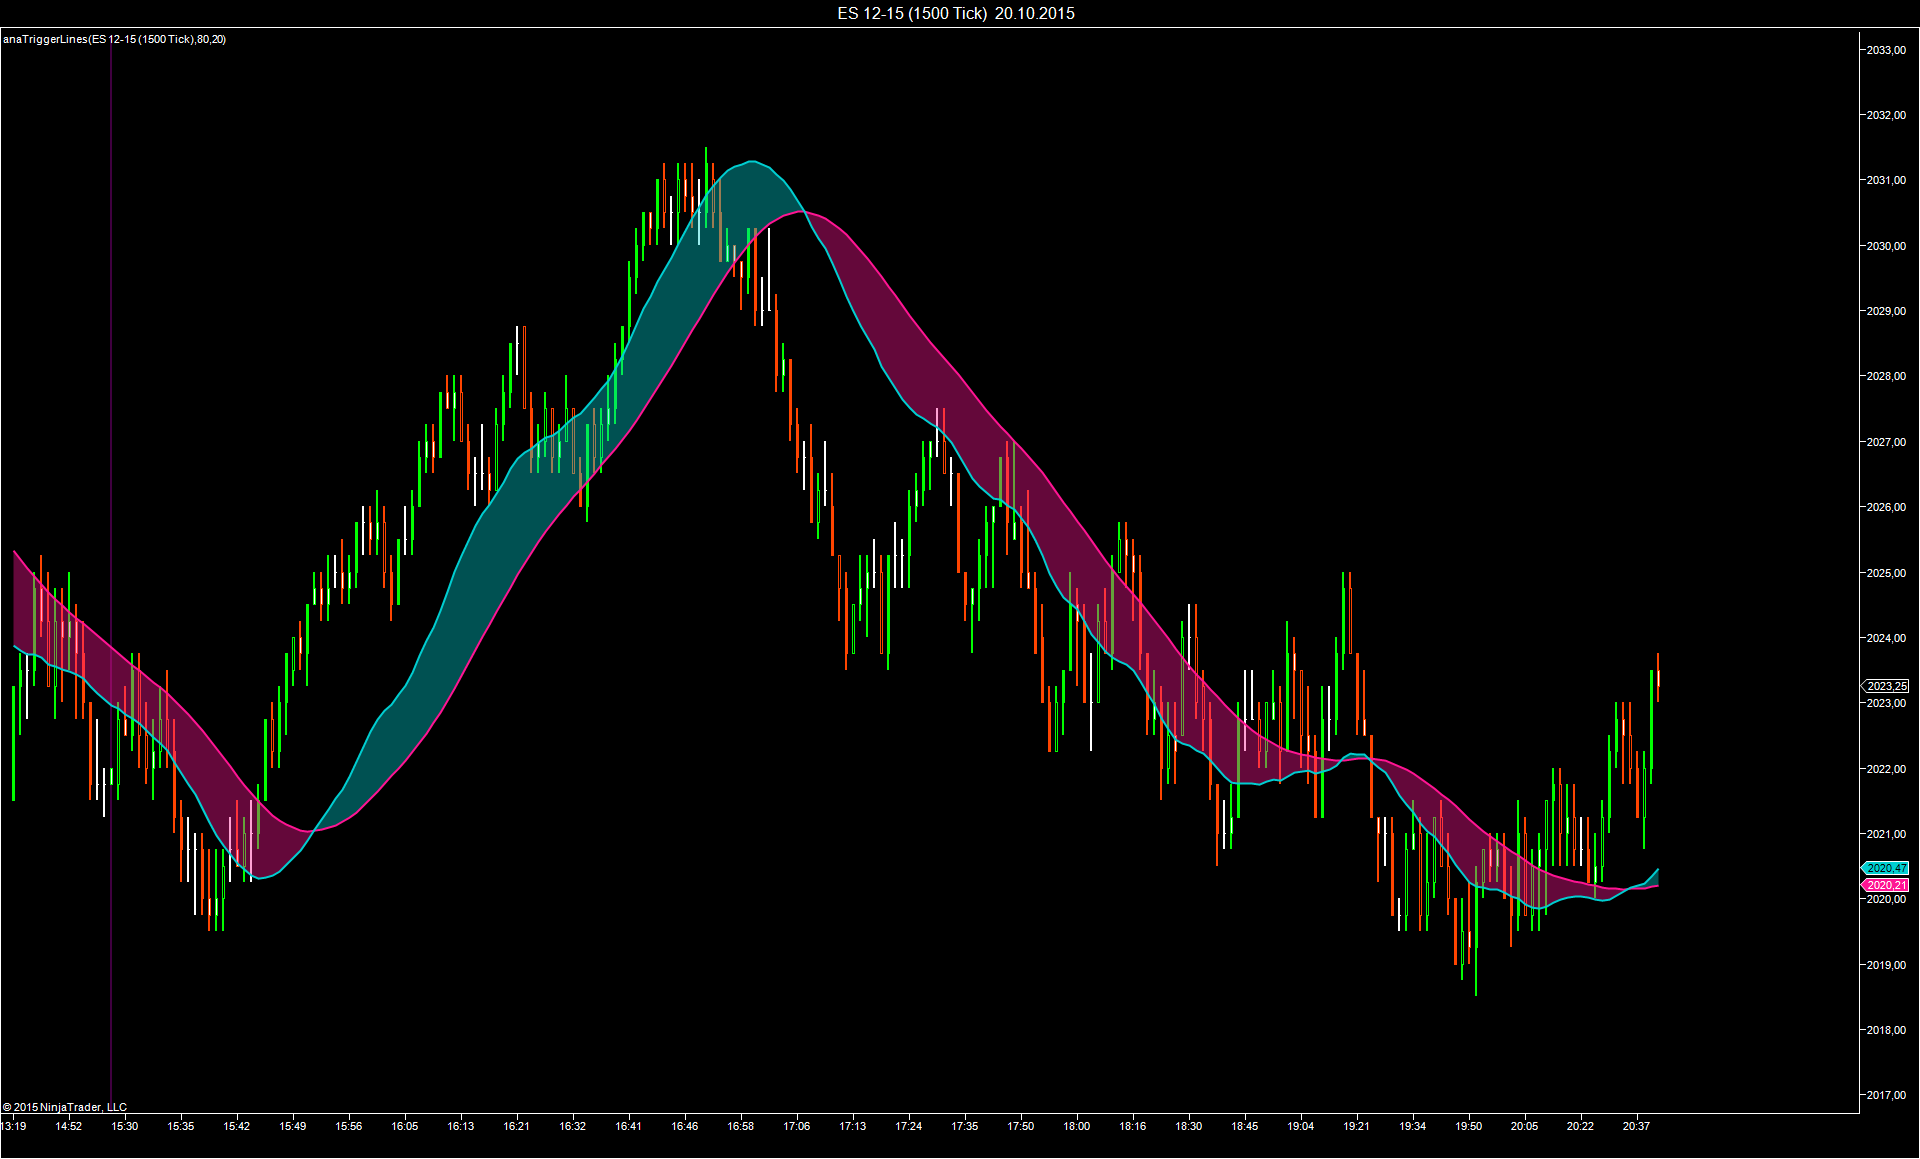 Ema cross trend indicator